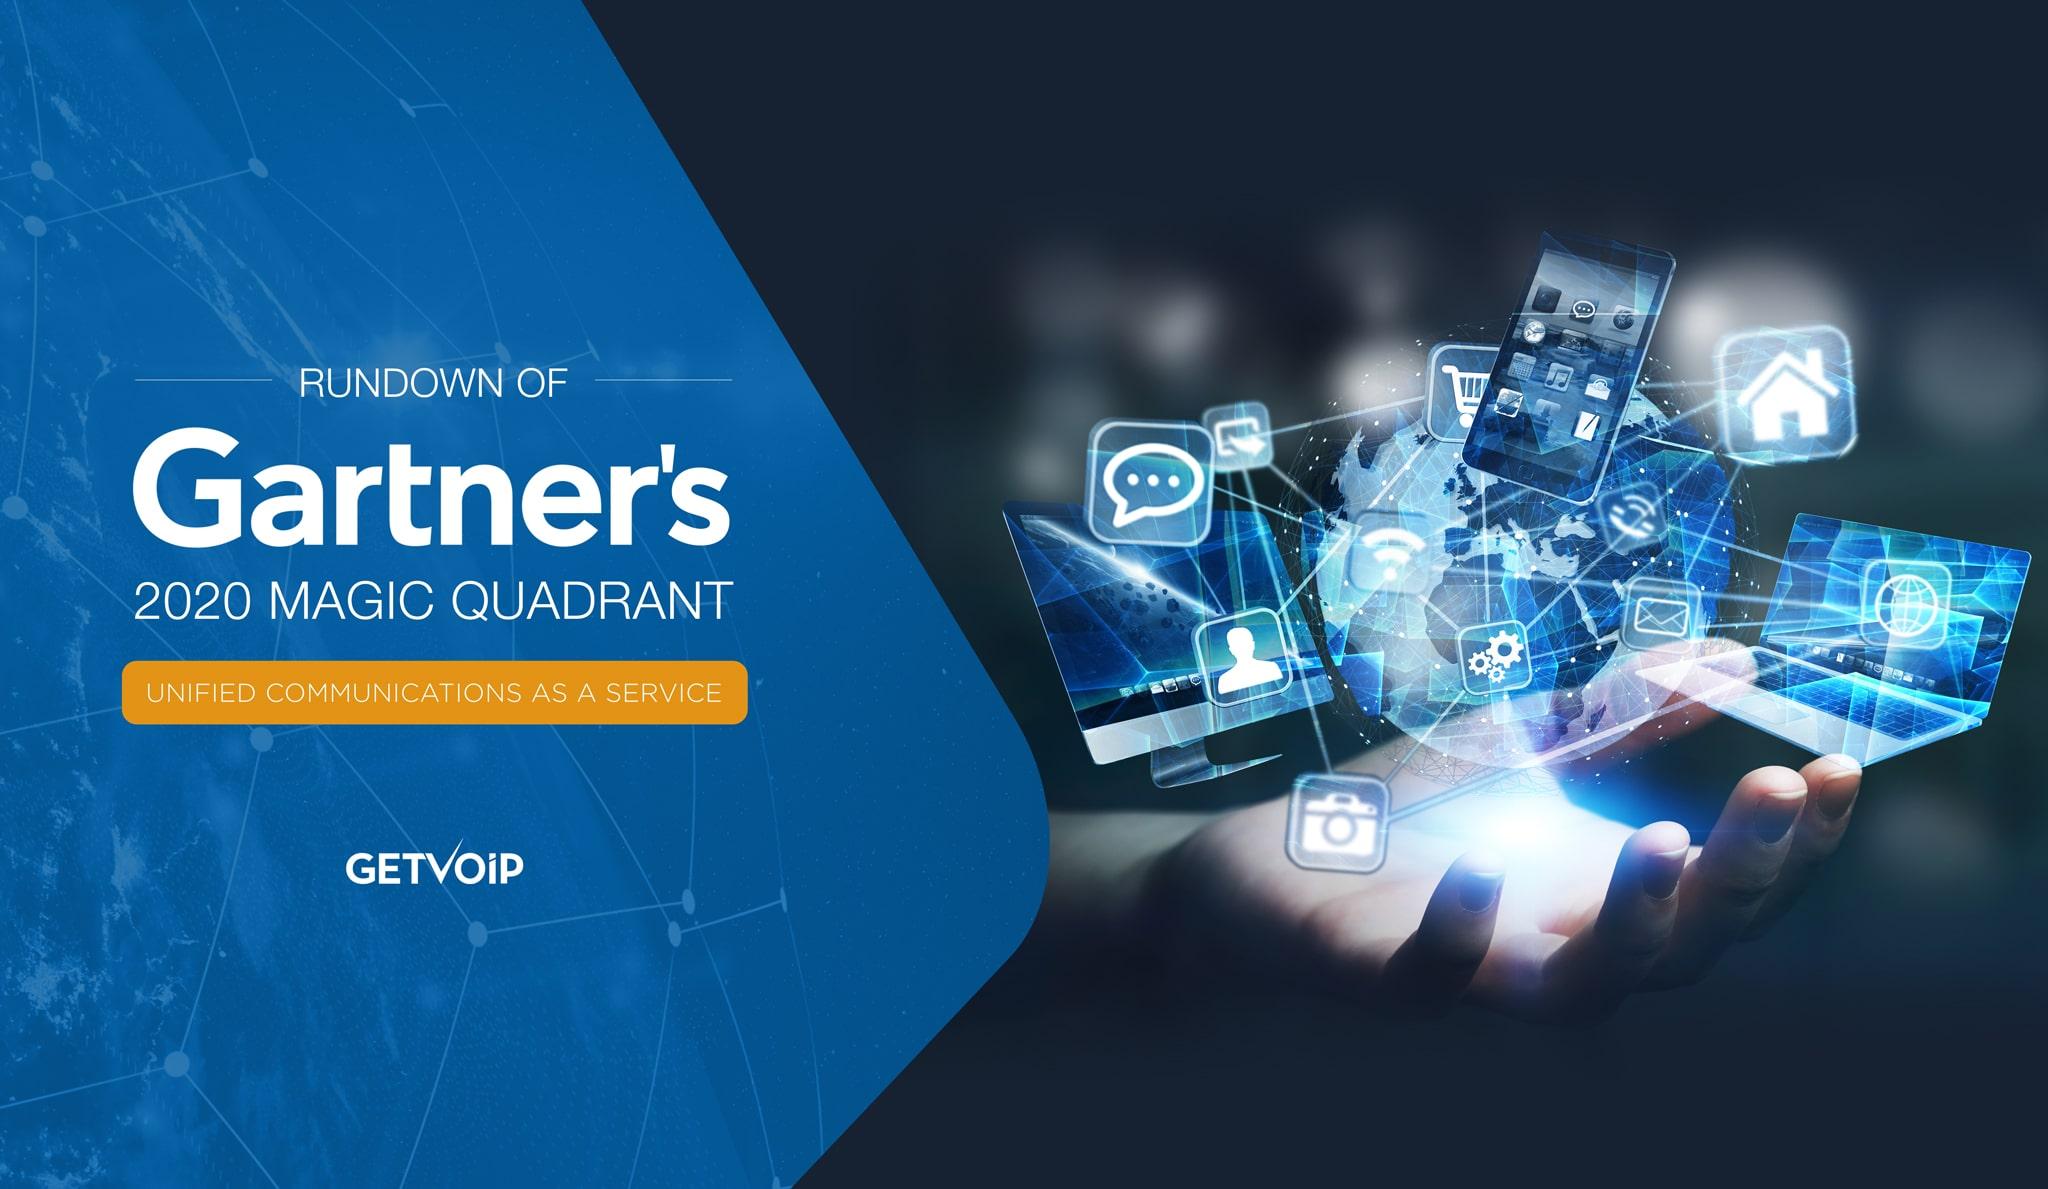 UCaaS Magic Quadrant 2020: Our Review of Gartner's Report